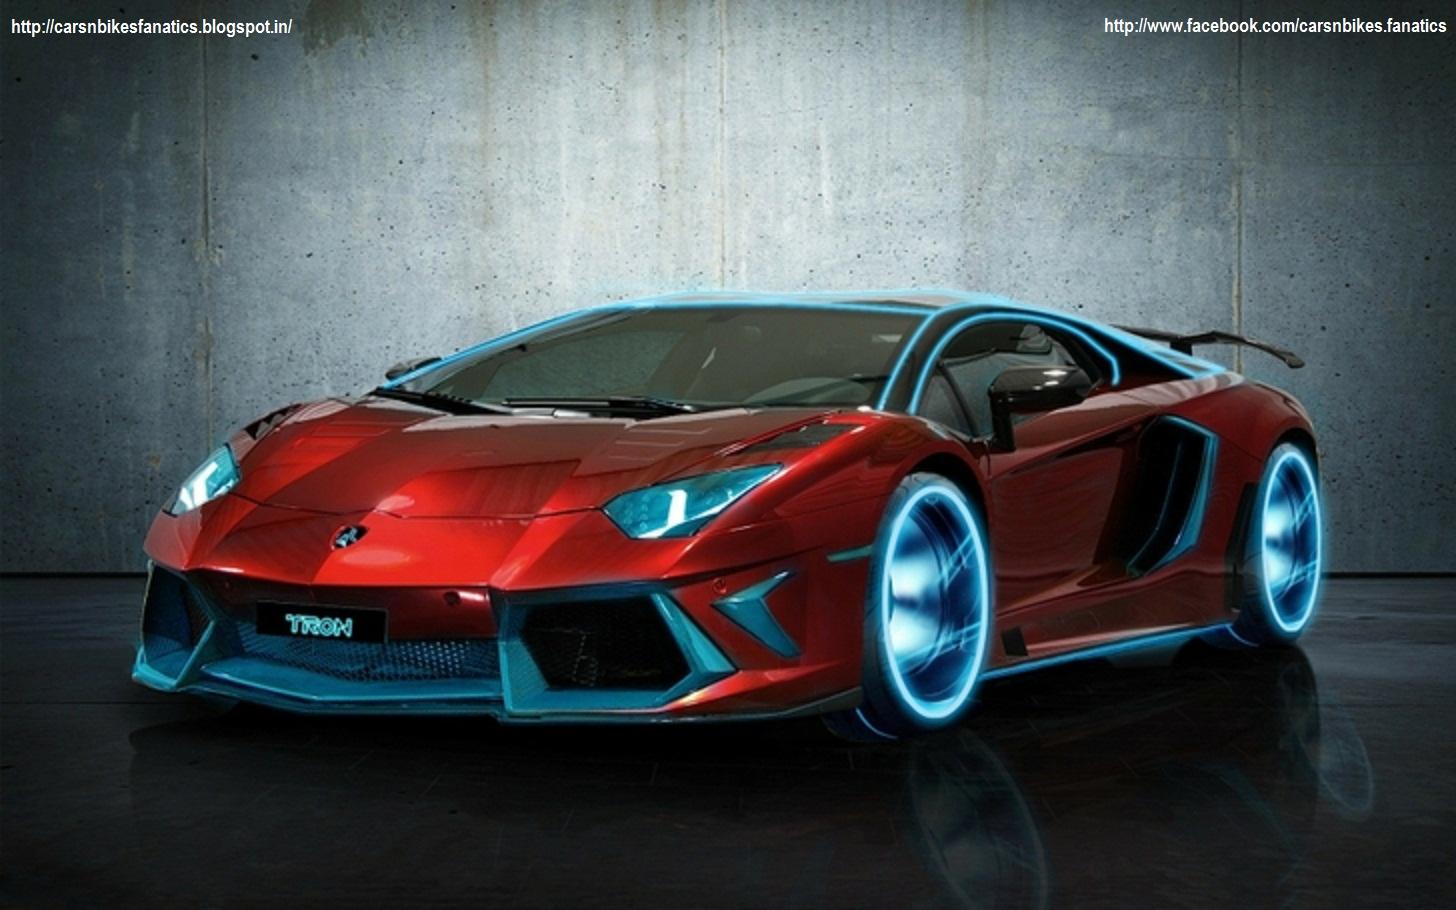 Car & Bike Fanatics: Lamborghini Aventador Tron as our new Profile Picture on our Page on Facebook